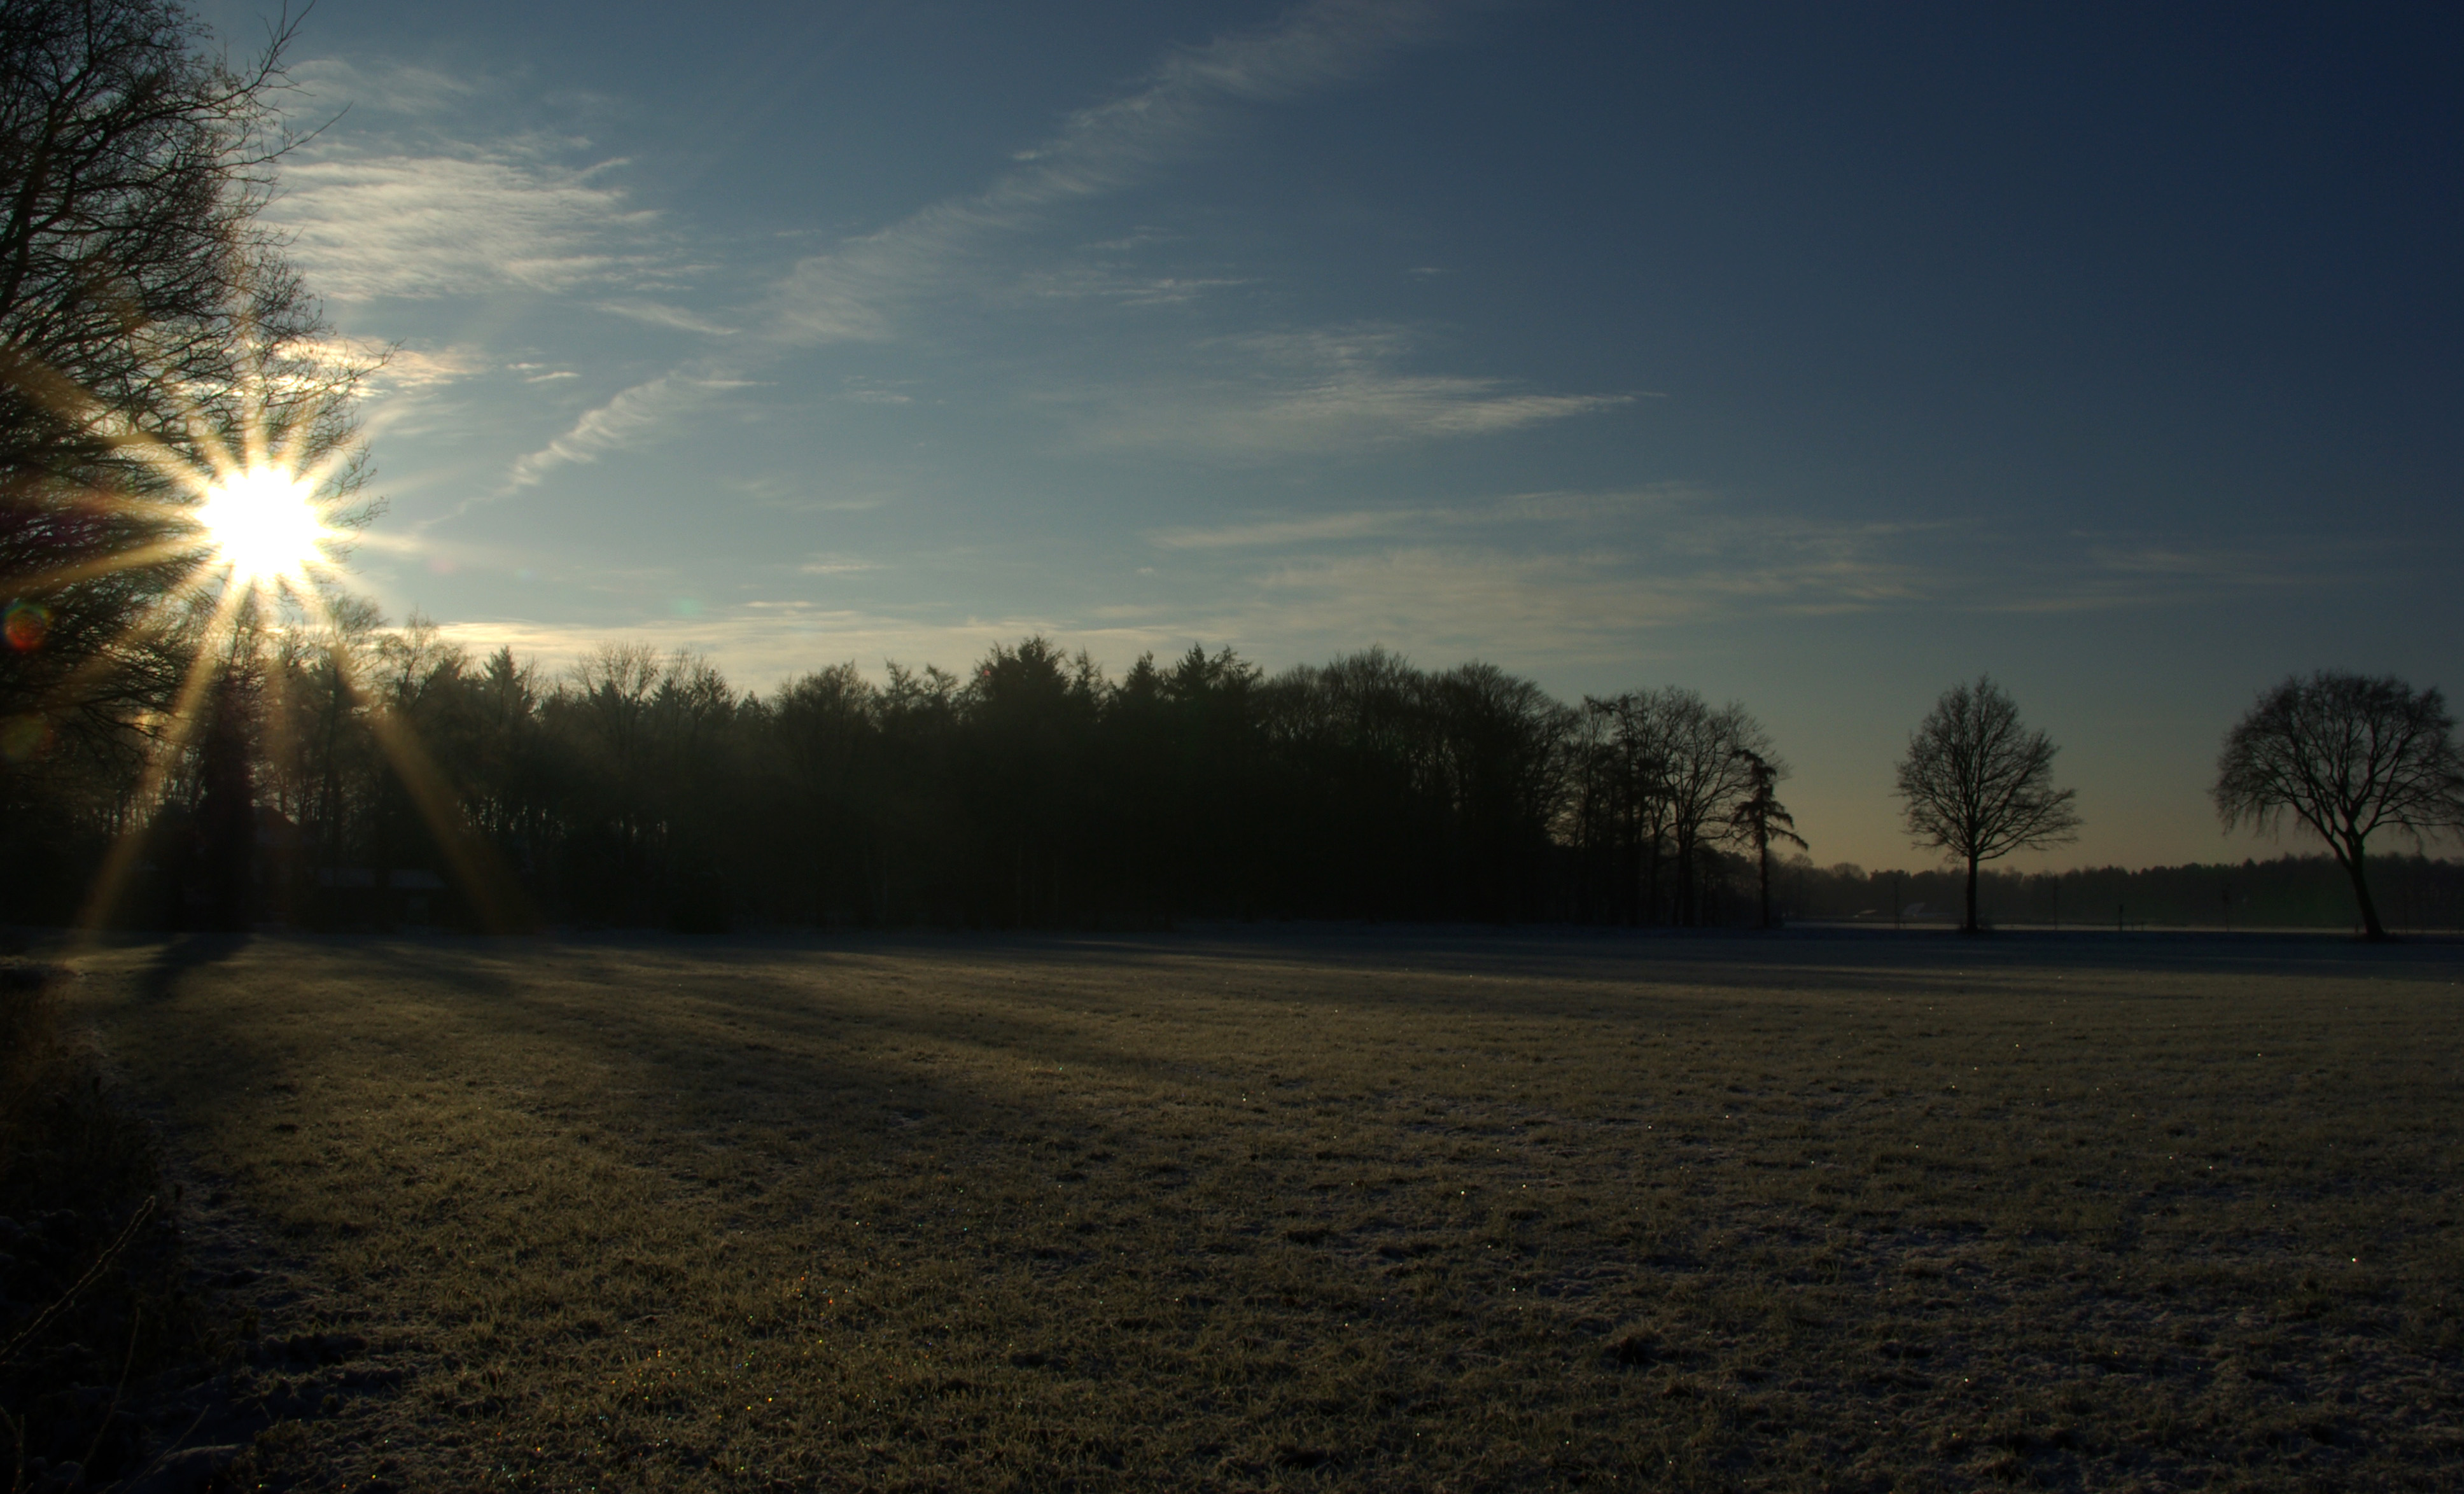 File:Winter Wonderland (8254380177).jpg - Wikimedia Commons